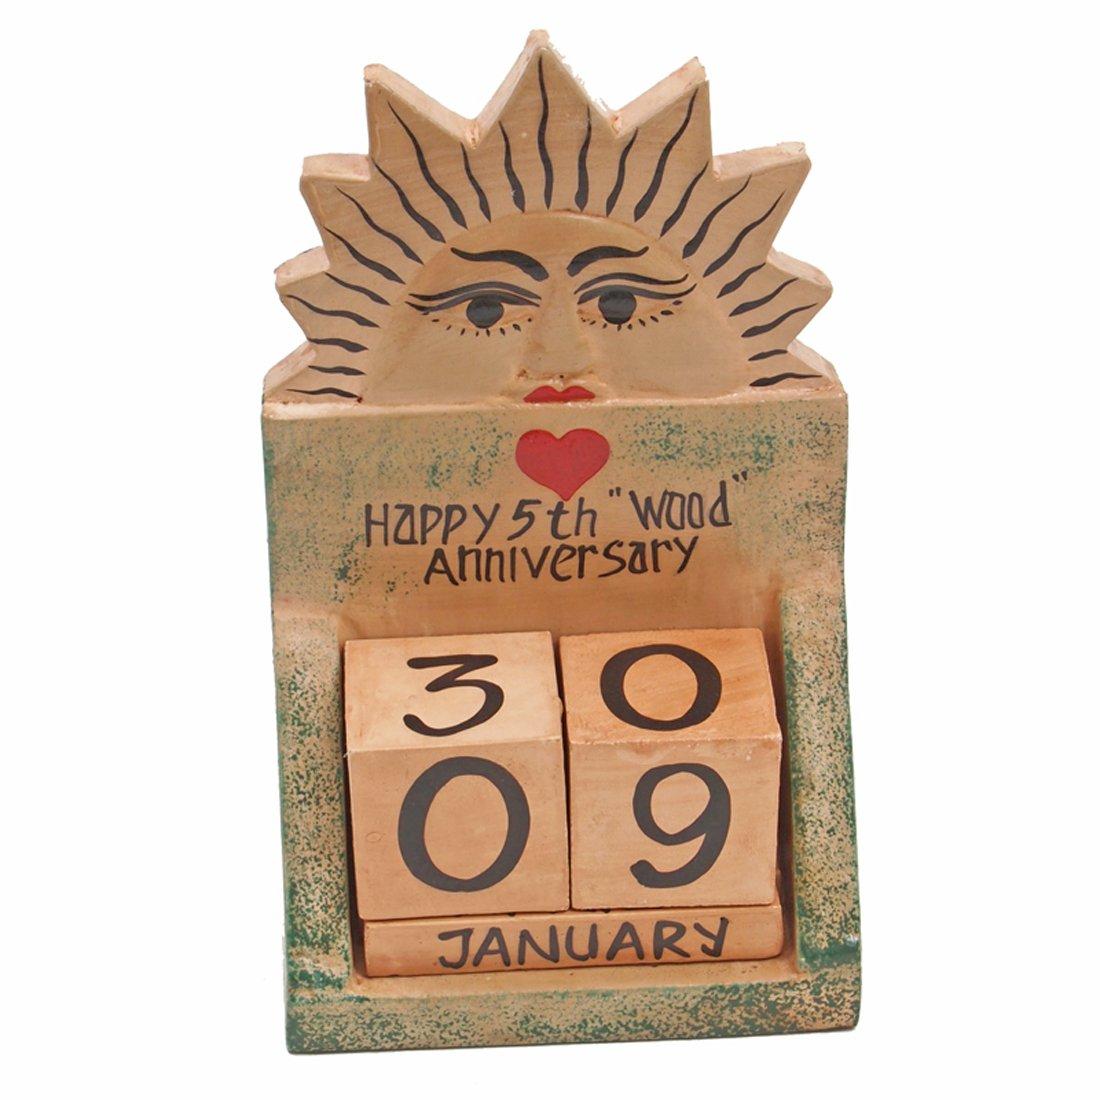 JustPaperRoses 5th Wedding Anniversary Gift Wood Calendar